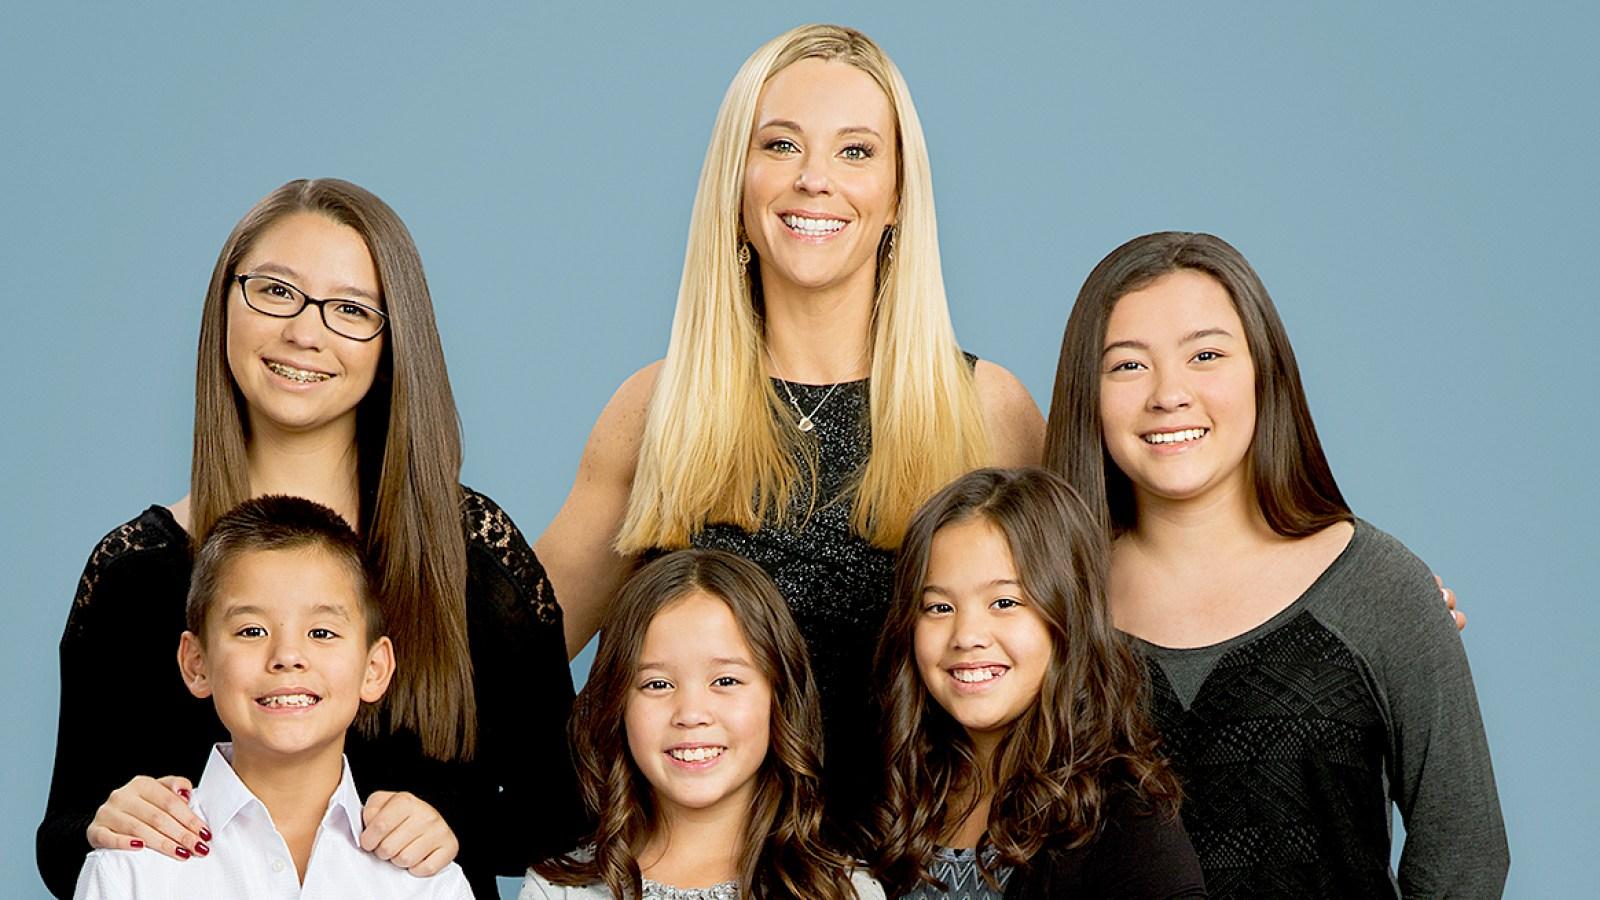 Jon and Kate Gosselin's Twins Cara and Maddie Turn 18